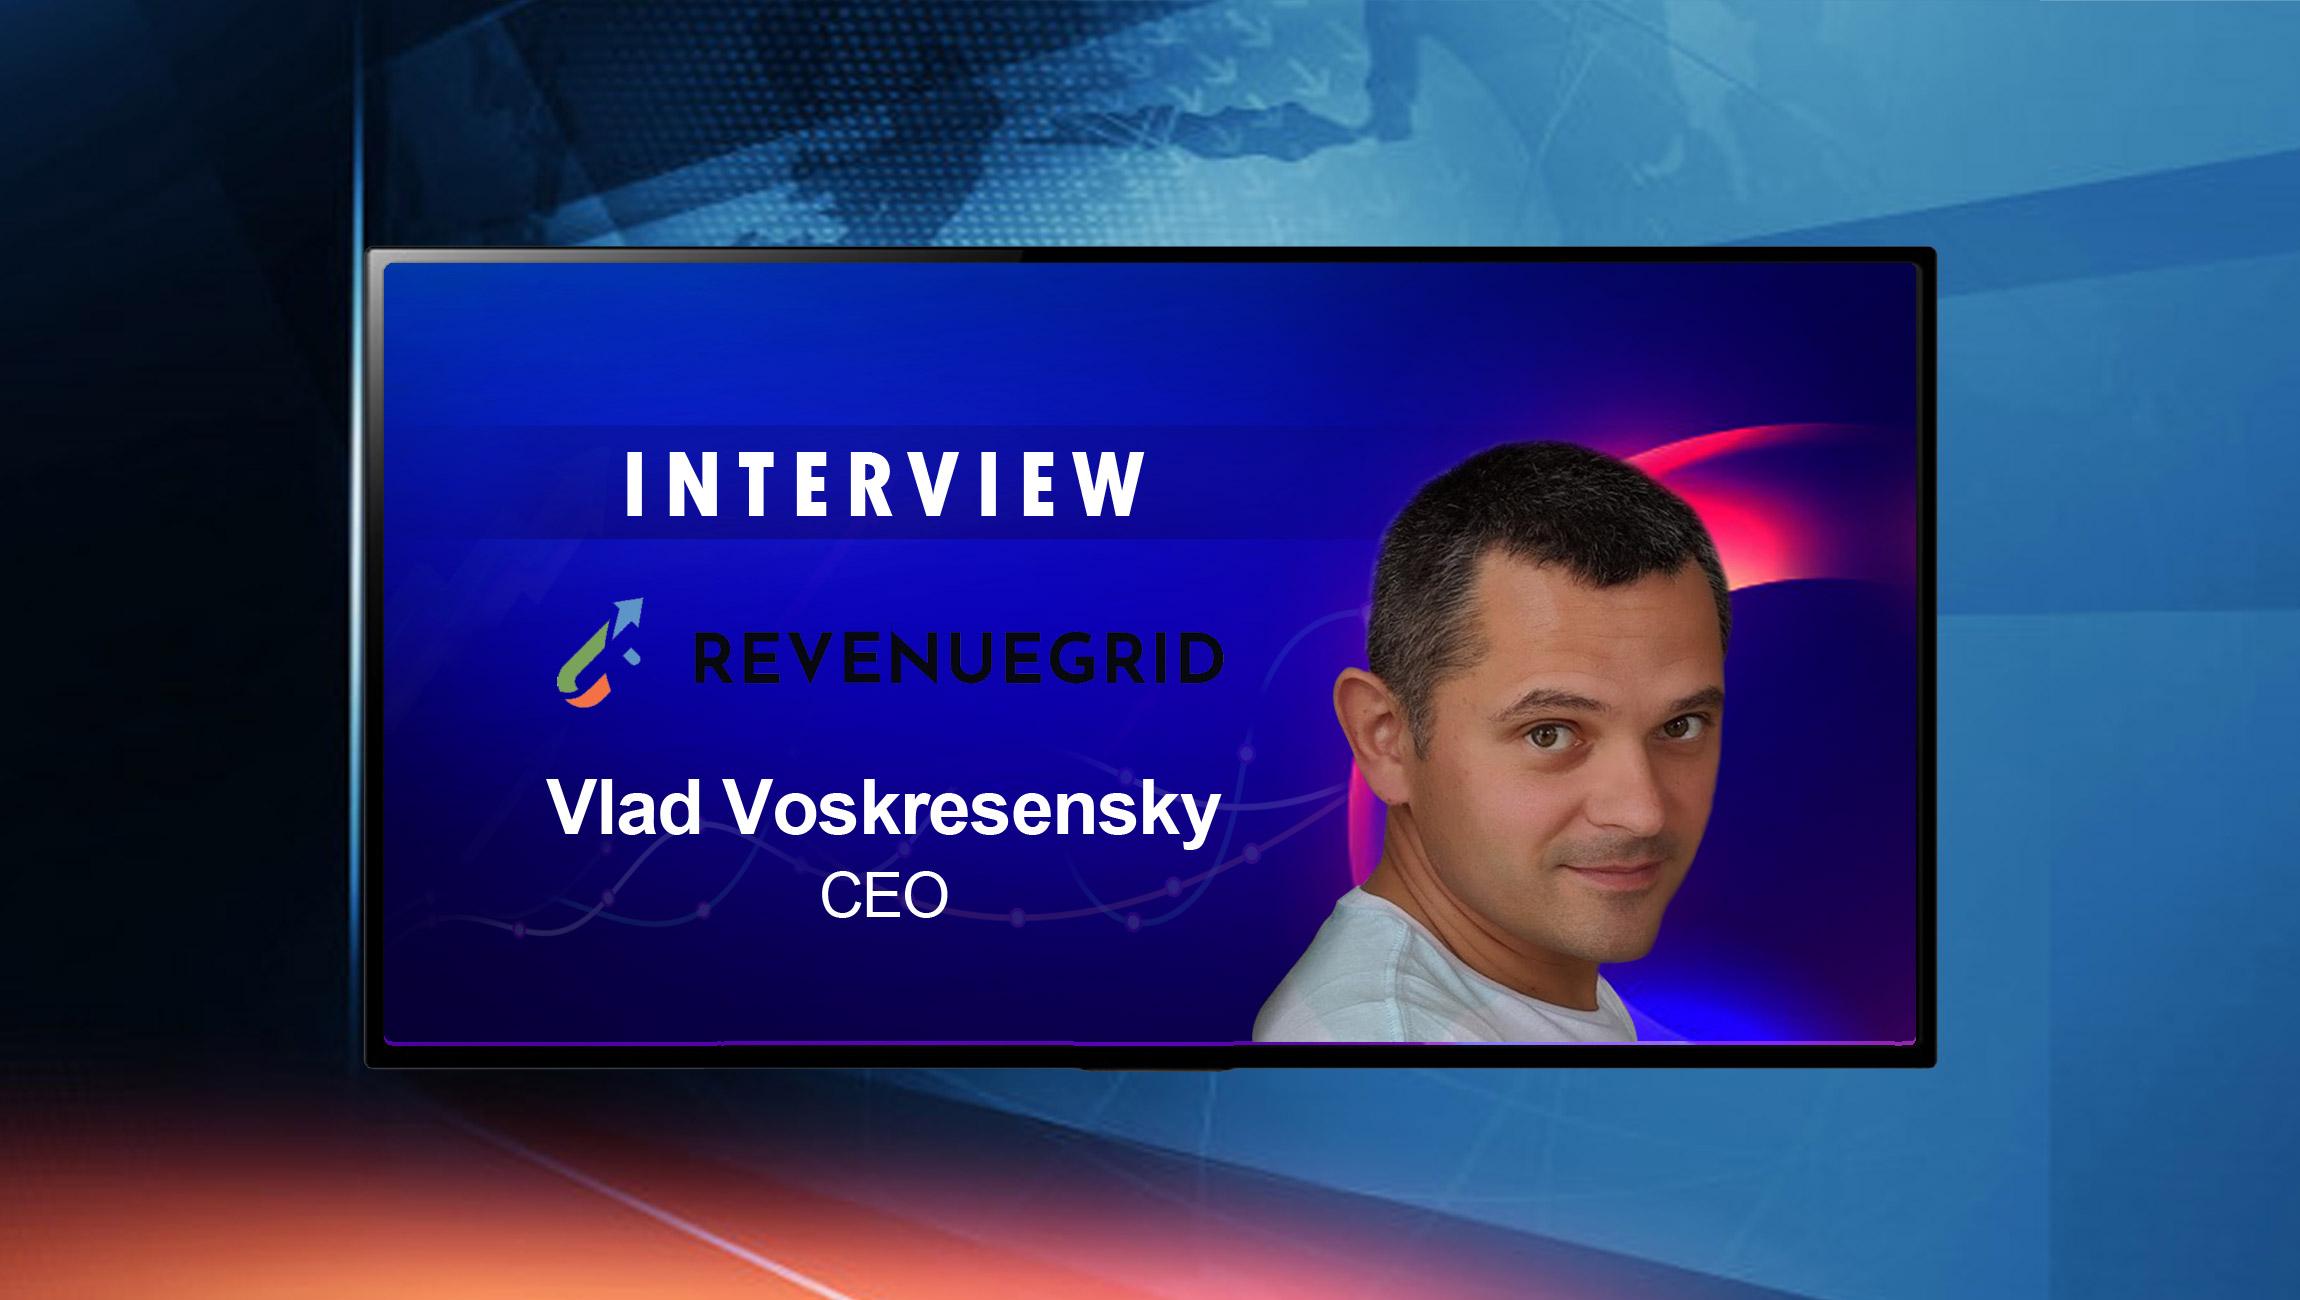 SalesTechStar Interview with Vlad Voskresensky, CEO at Revenue Grid